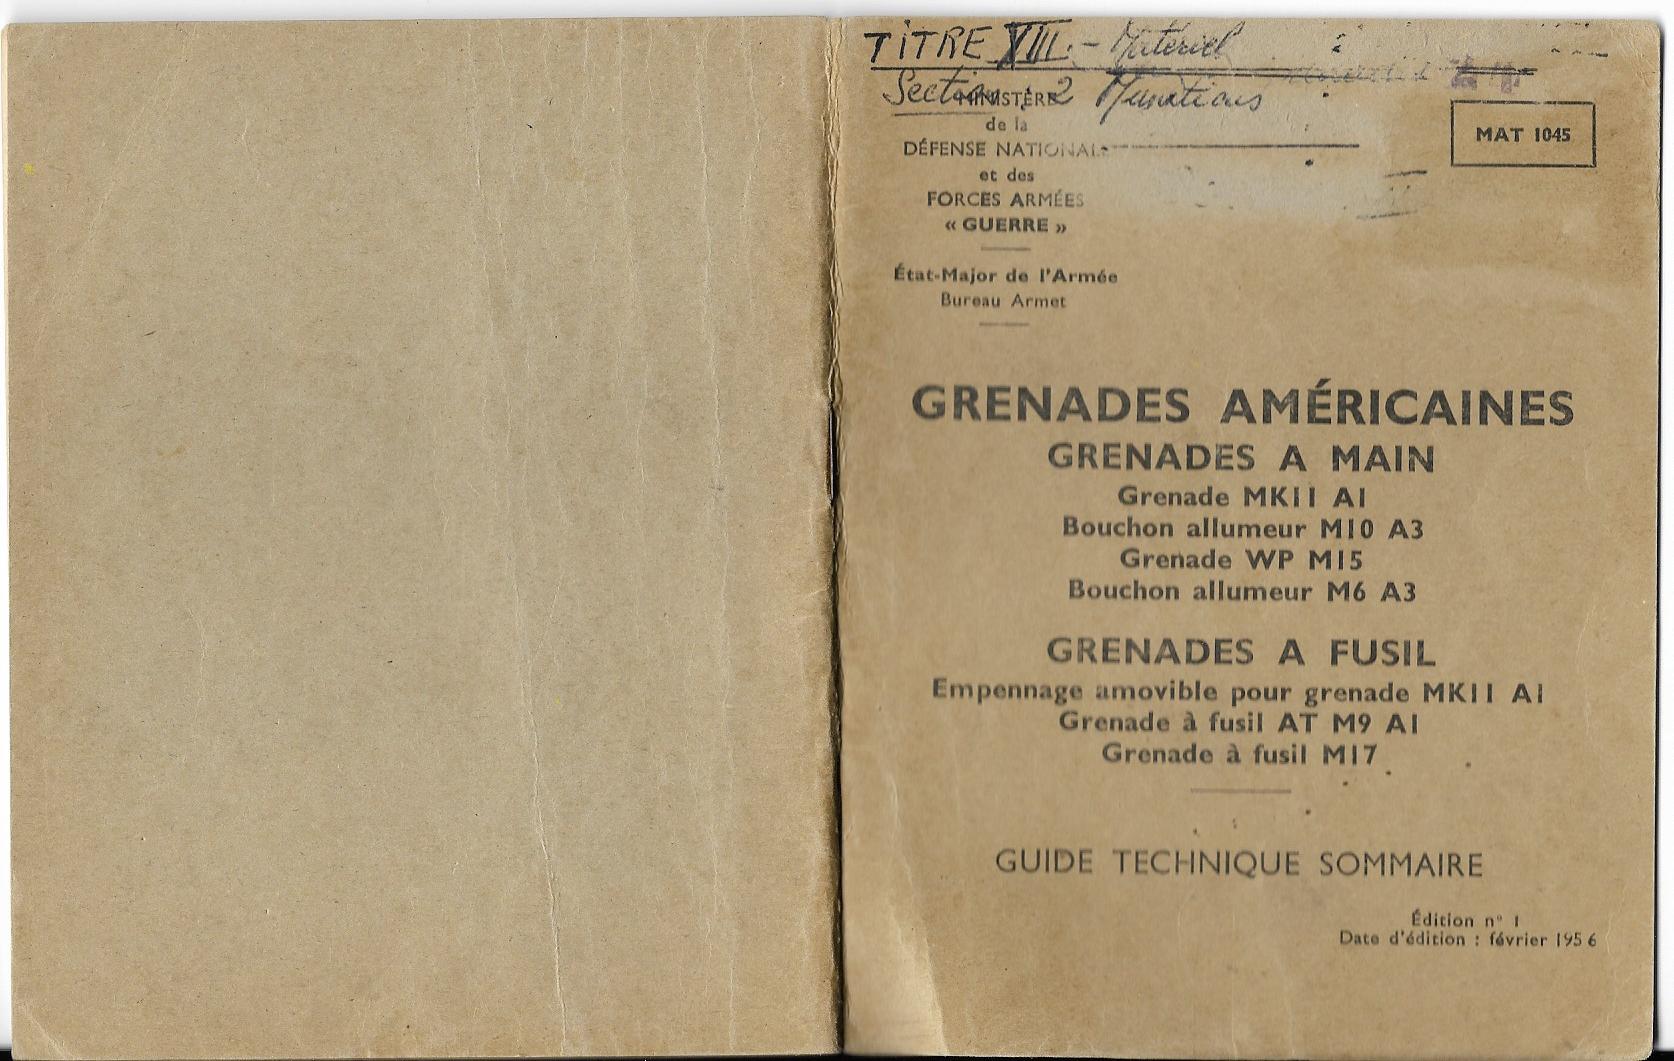 Grenades americaines